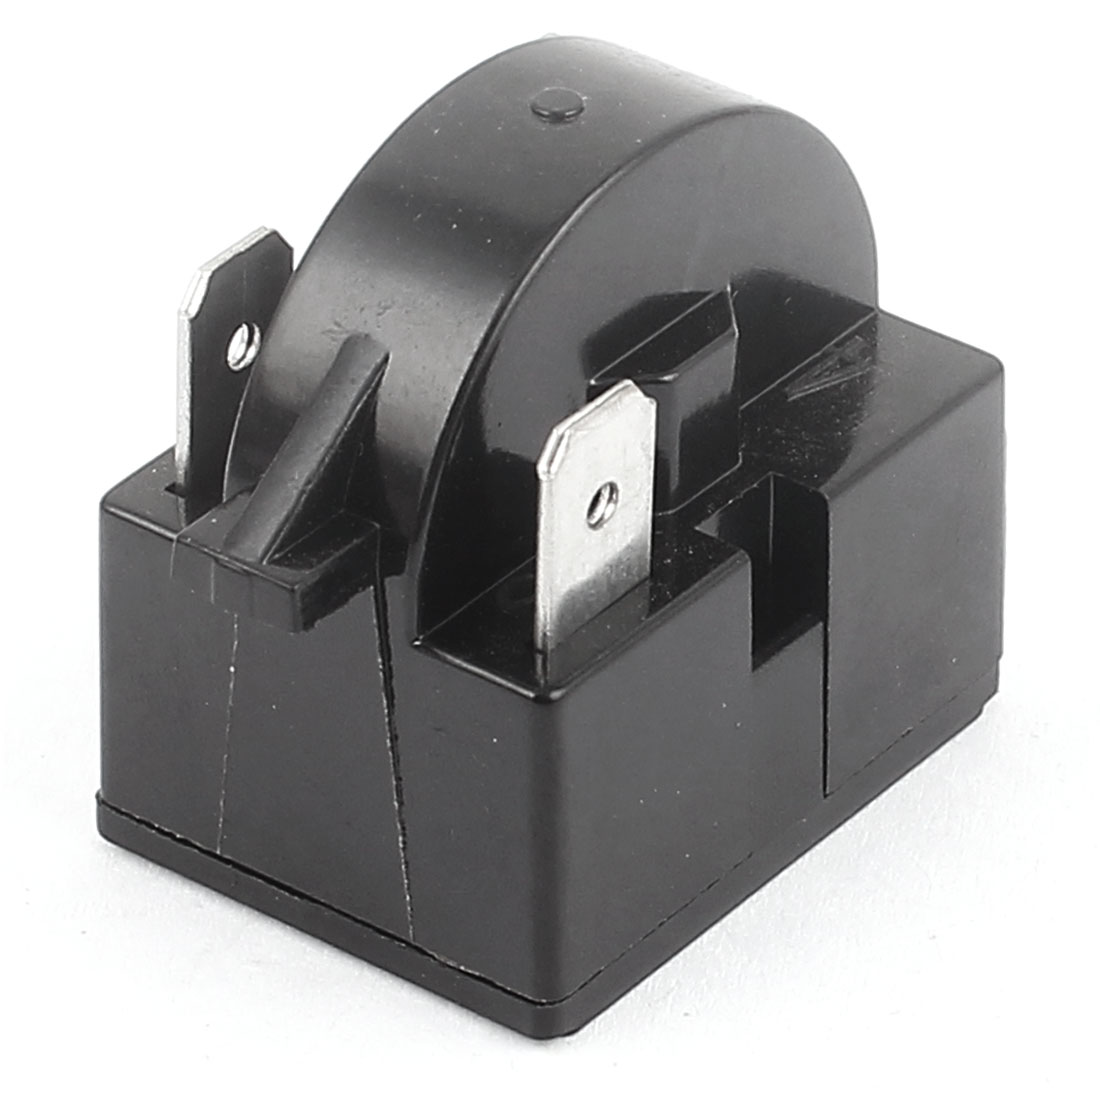 Black Plastic Shell 15 Ohm Resistance 3 Terminals Refrigerator PTC Starter Relay 2